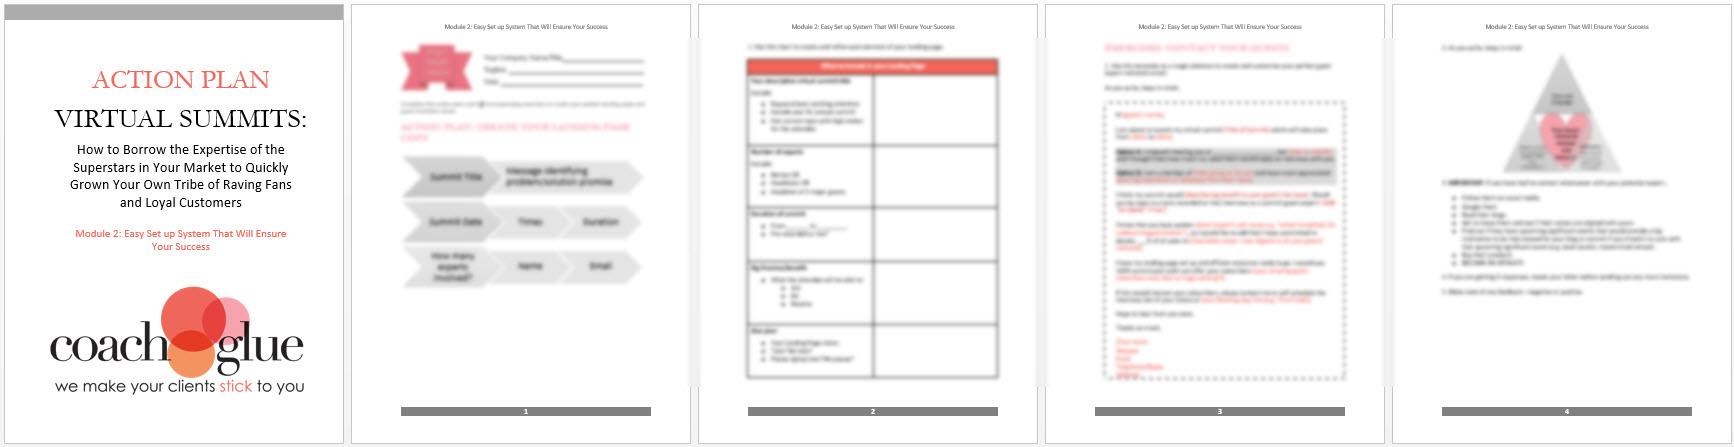 module 2 action plan